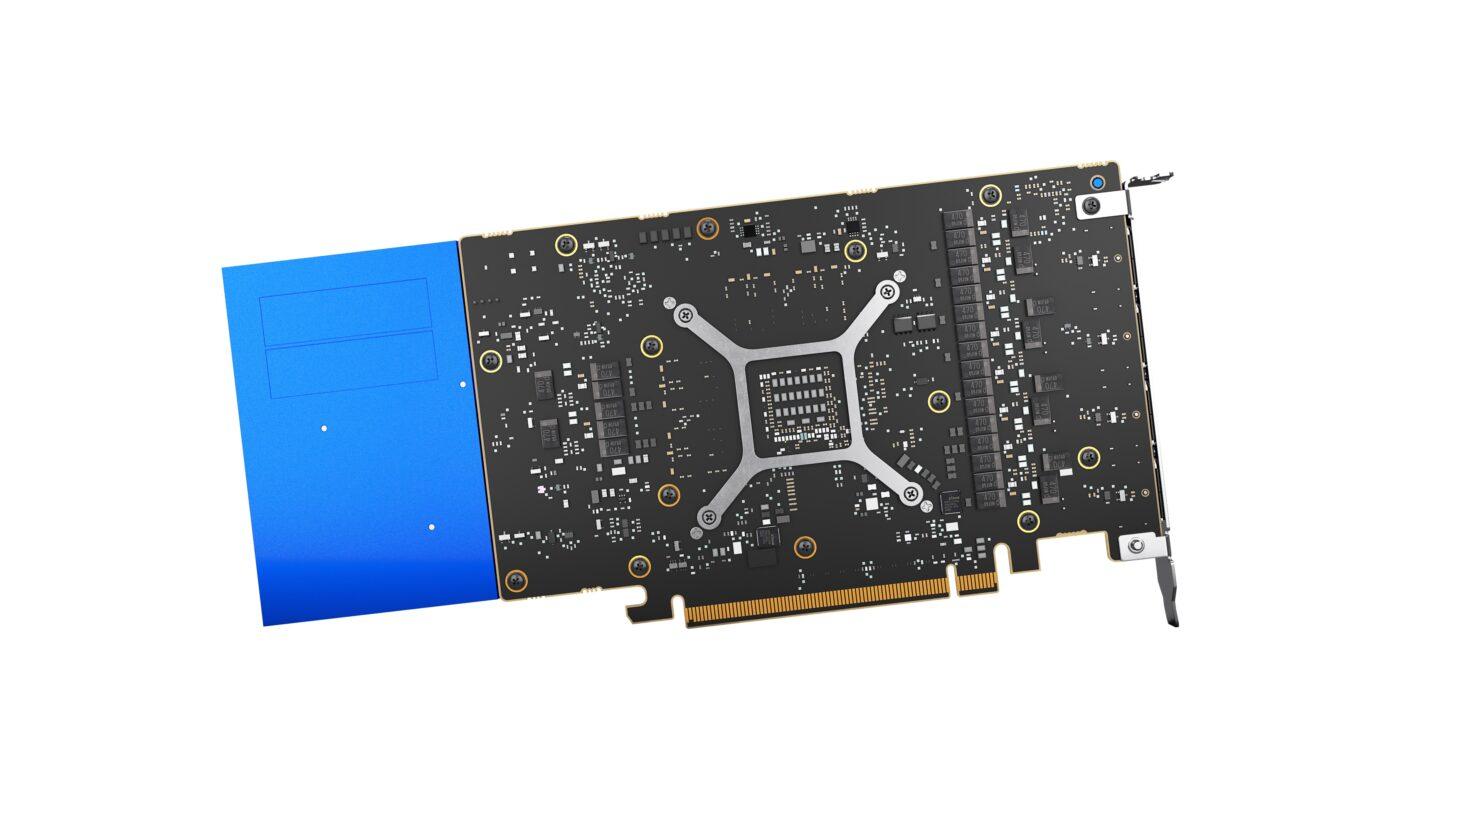 amd-radeon-pro-w6600-graphics-card-_3